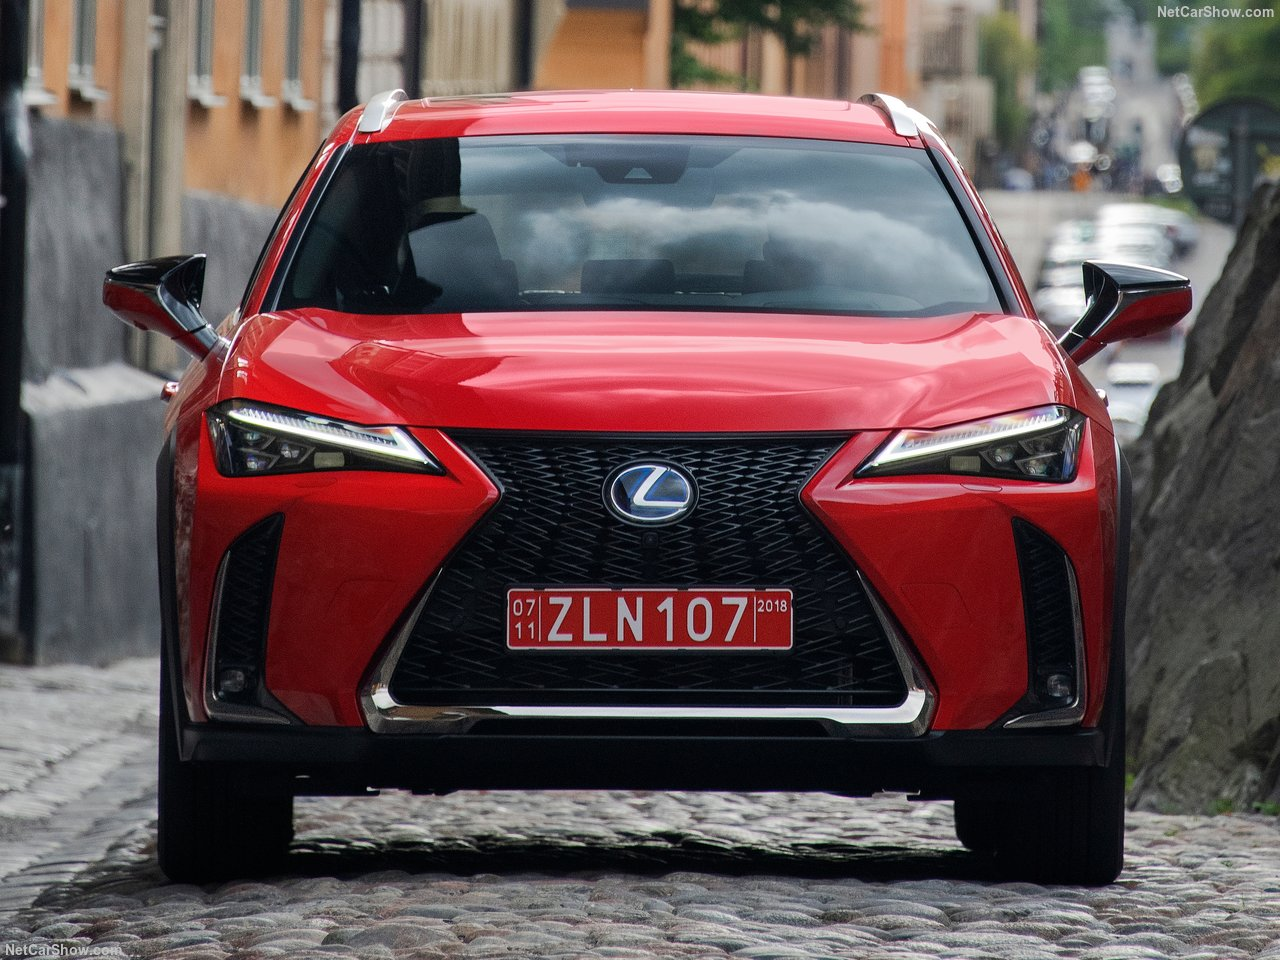 Lexus-UX-2019-1280-6f.jpg